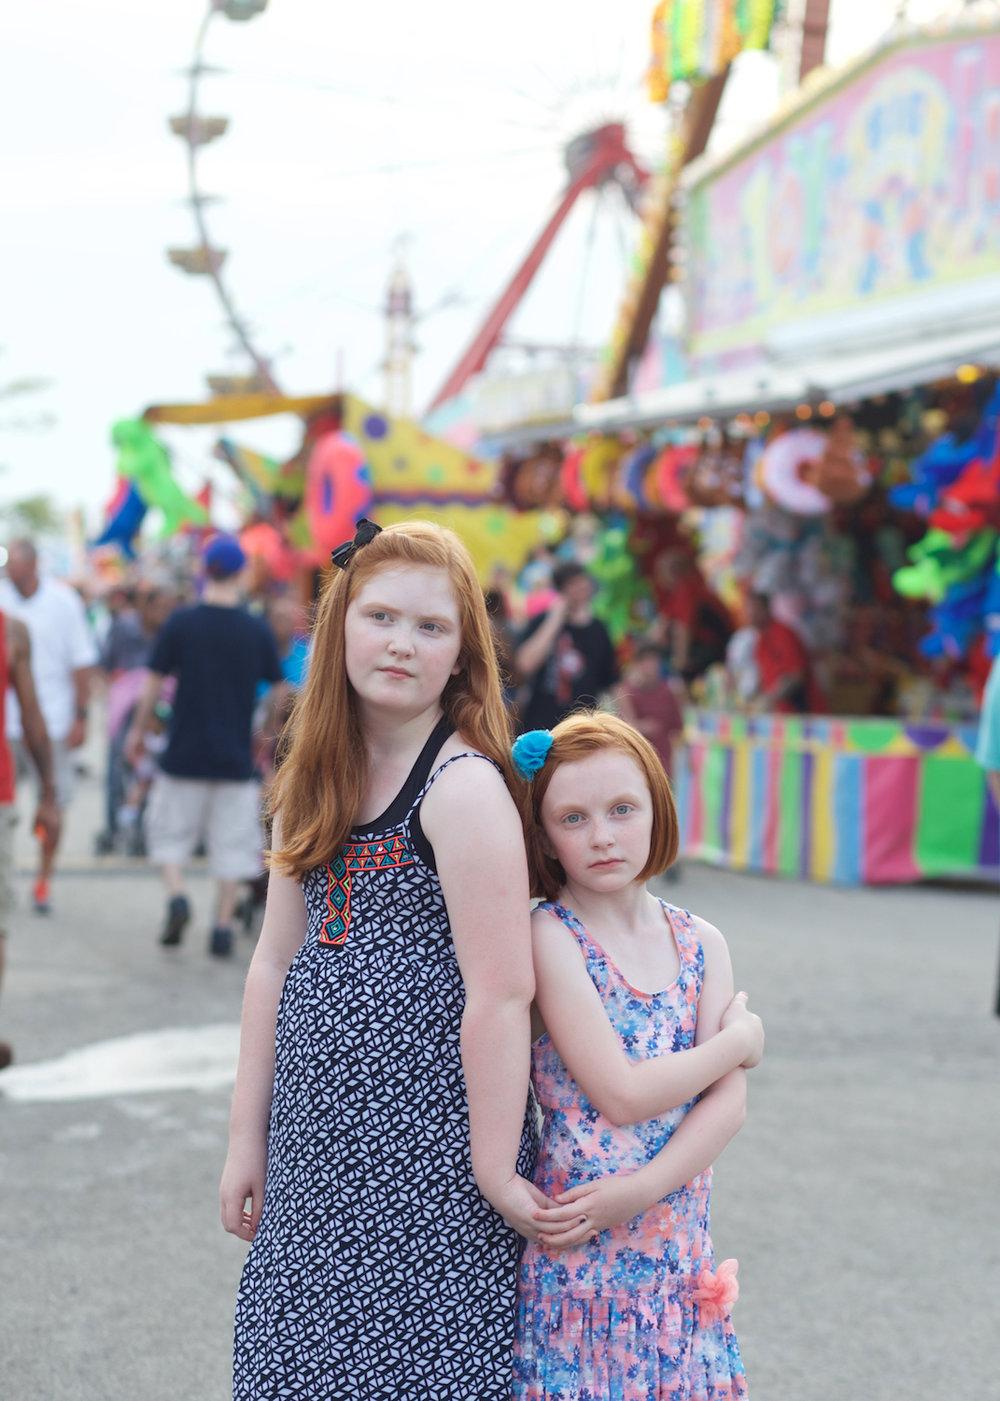 nashville middle tn family tween photographer 153.jpg